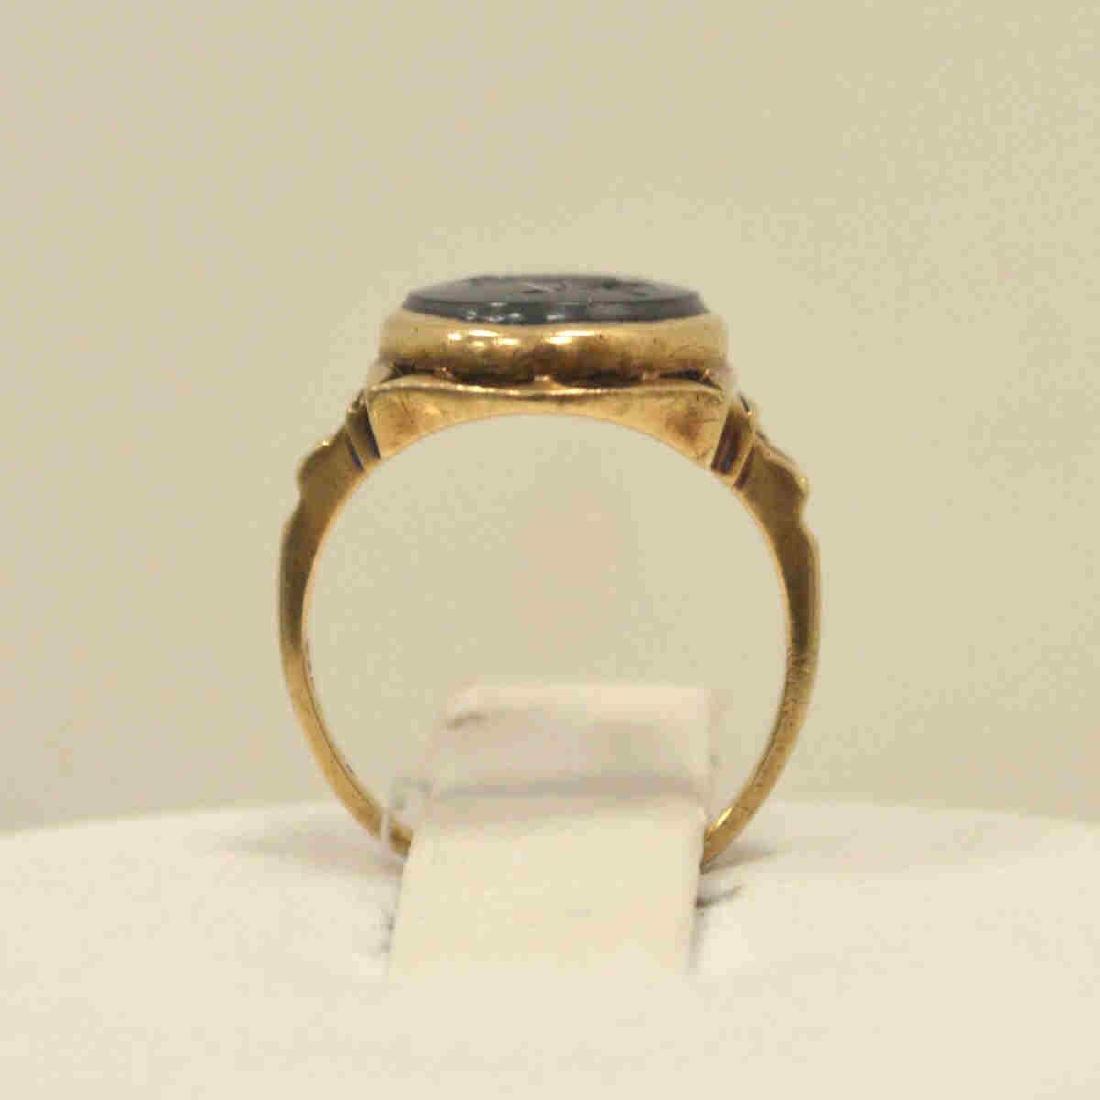 10kt yellow gold hematite intaglio ring - 3